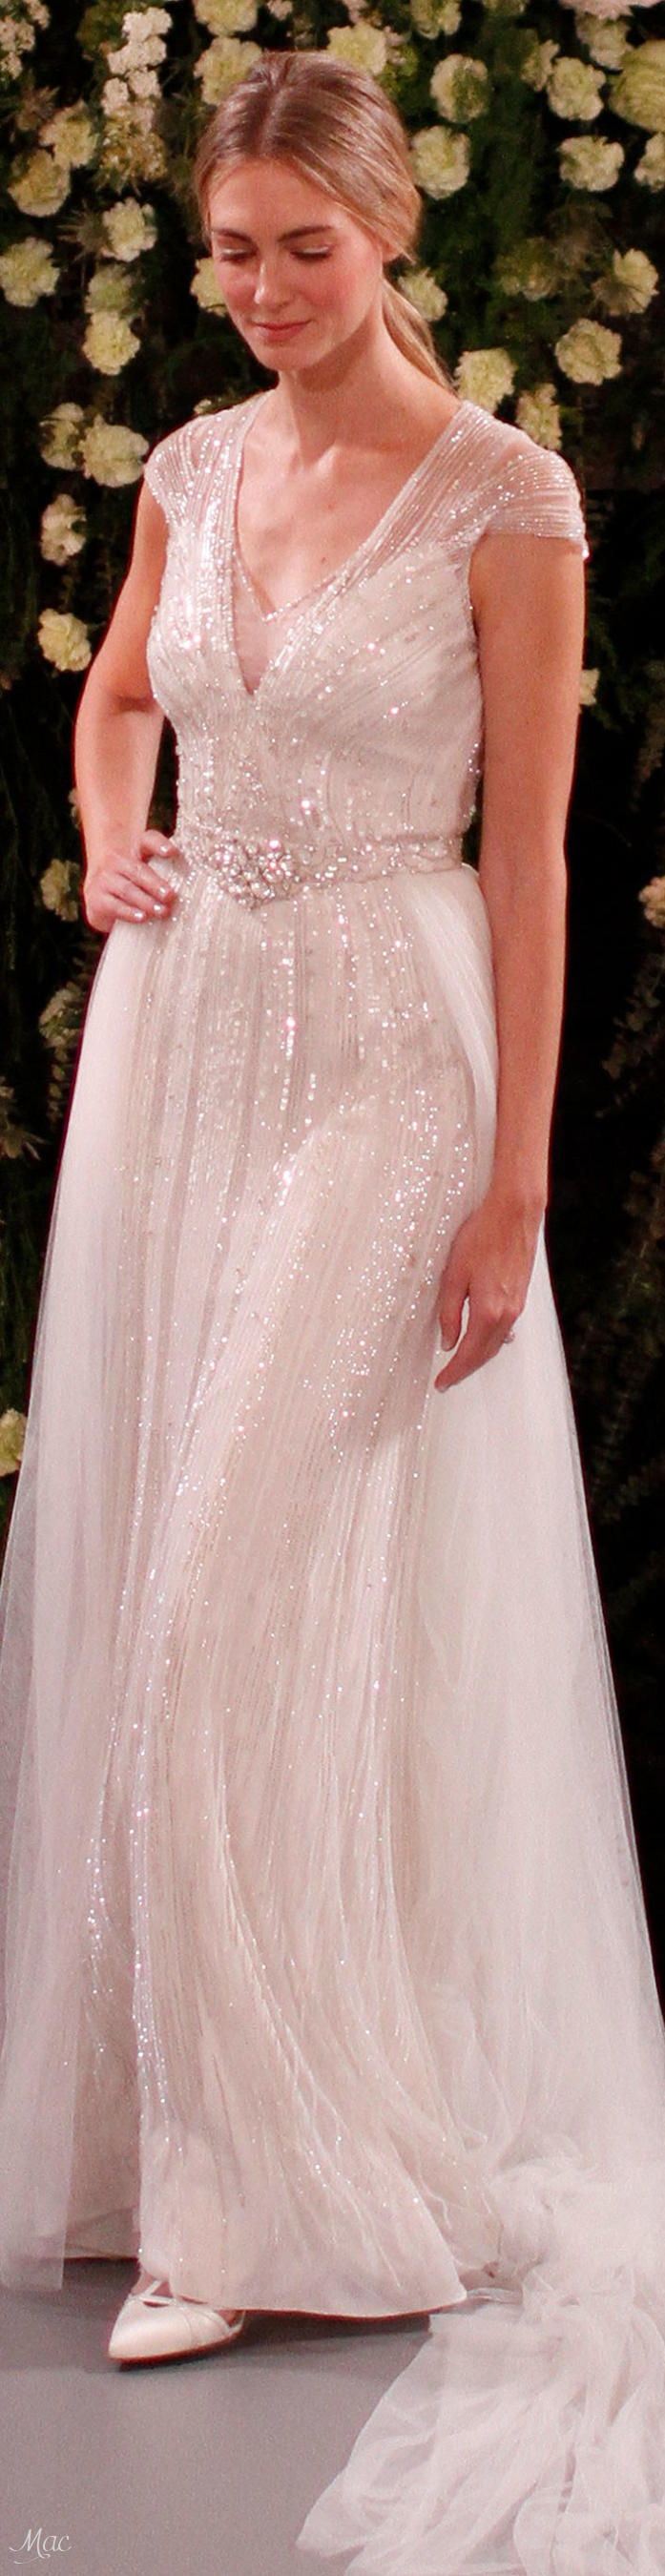 Spring 2019 Bridal Jenny Packham | Spring 2019 Bridal | Pinterest ...